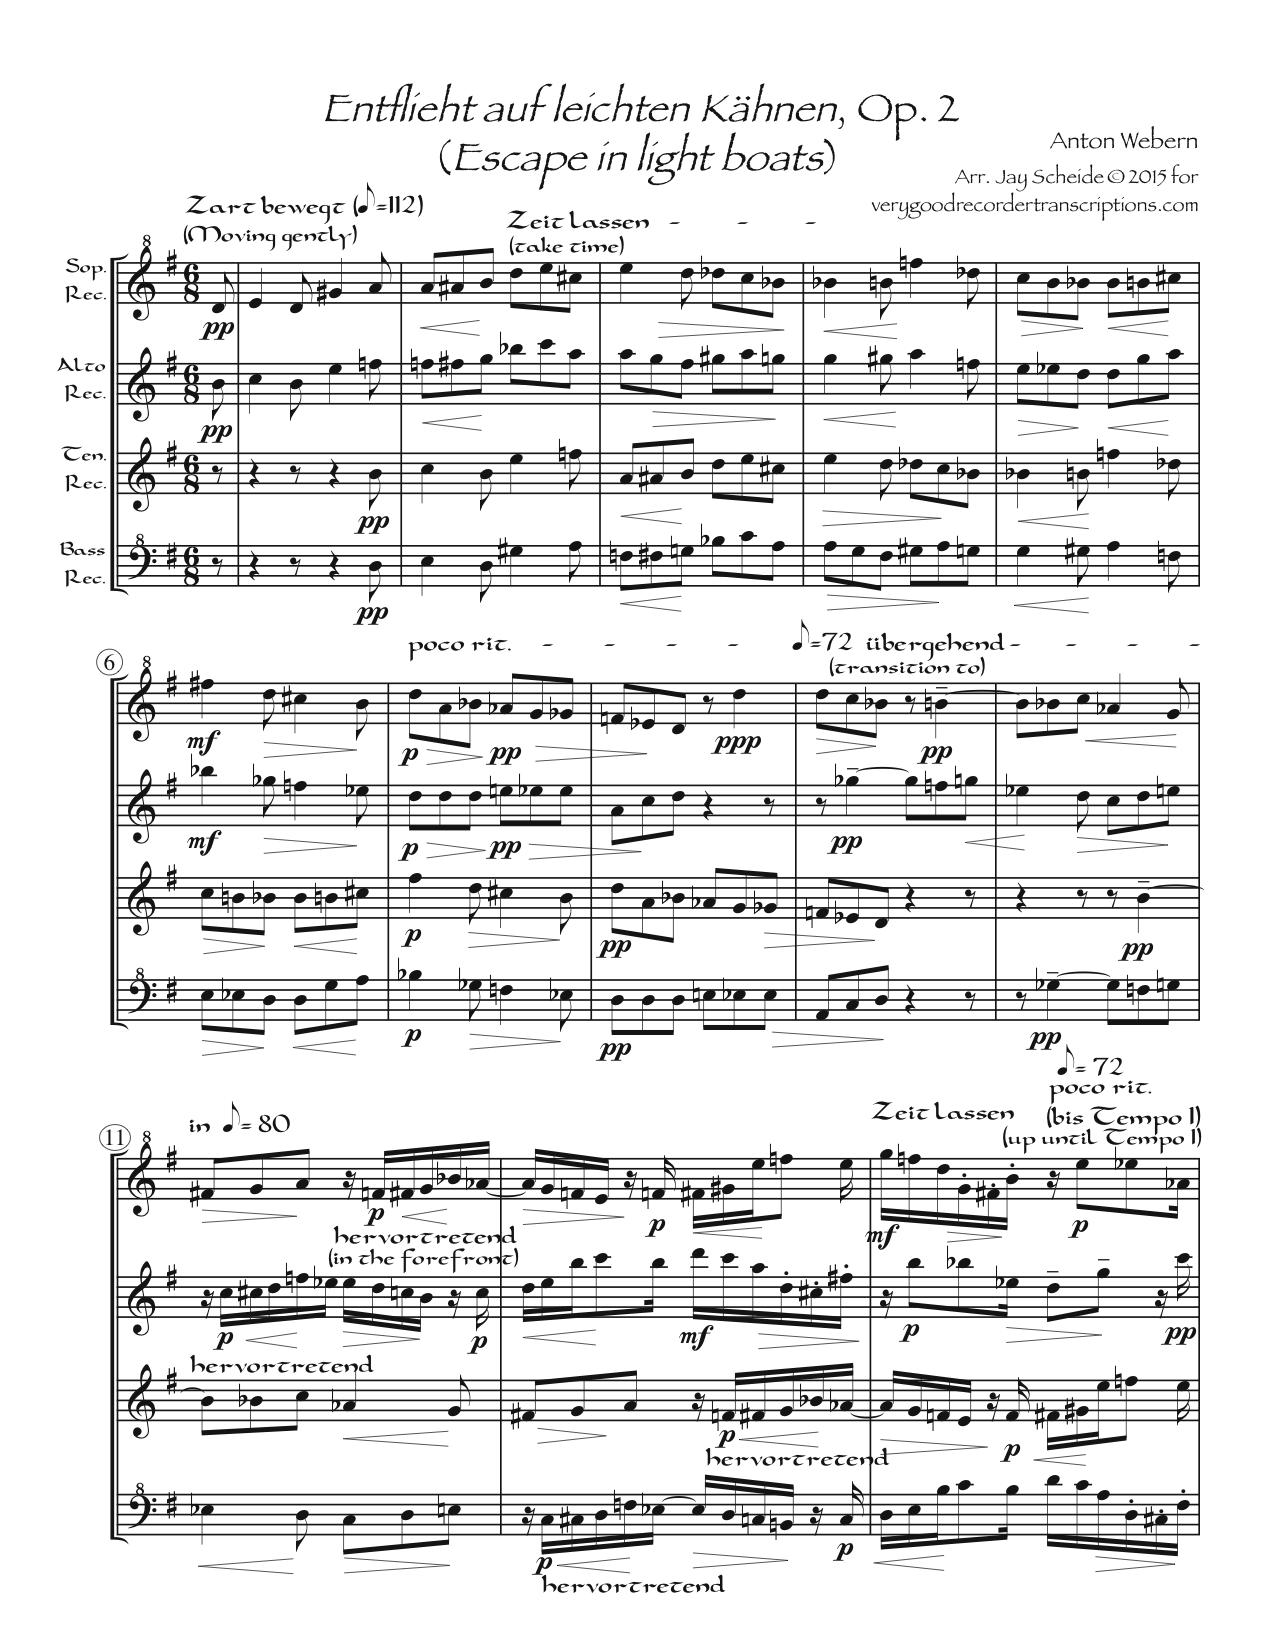 *Entflieht auf leichten Kähnen*, Op. 2, arr. for SATB recorders